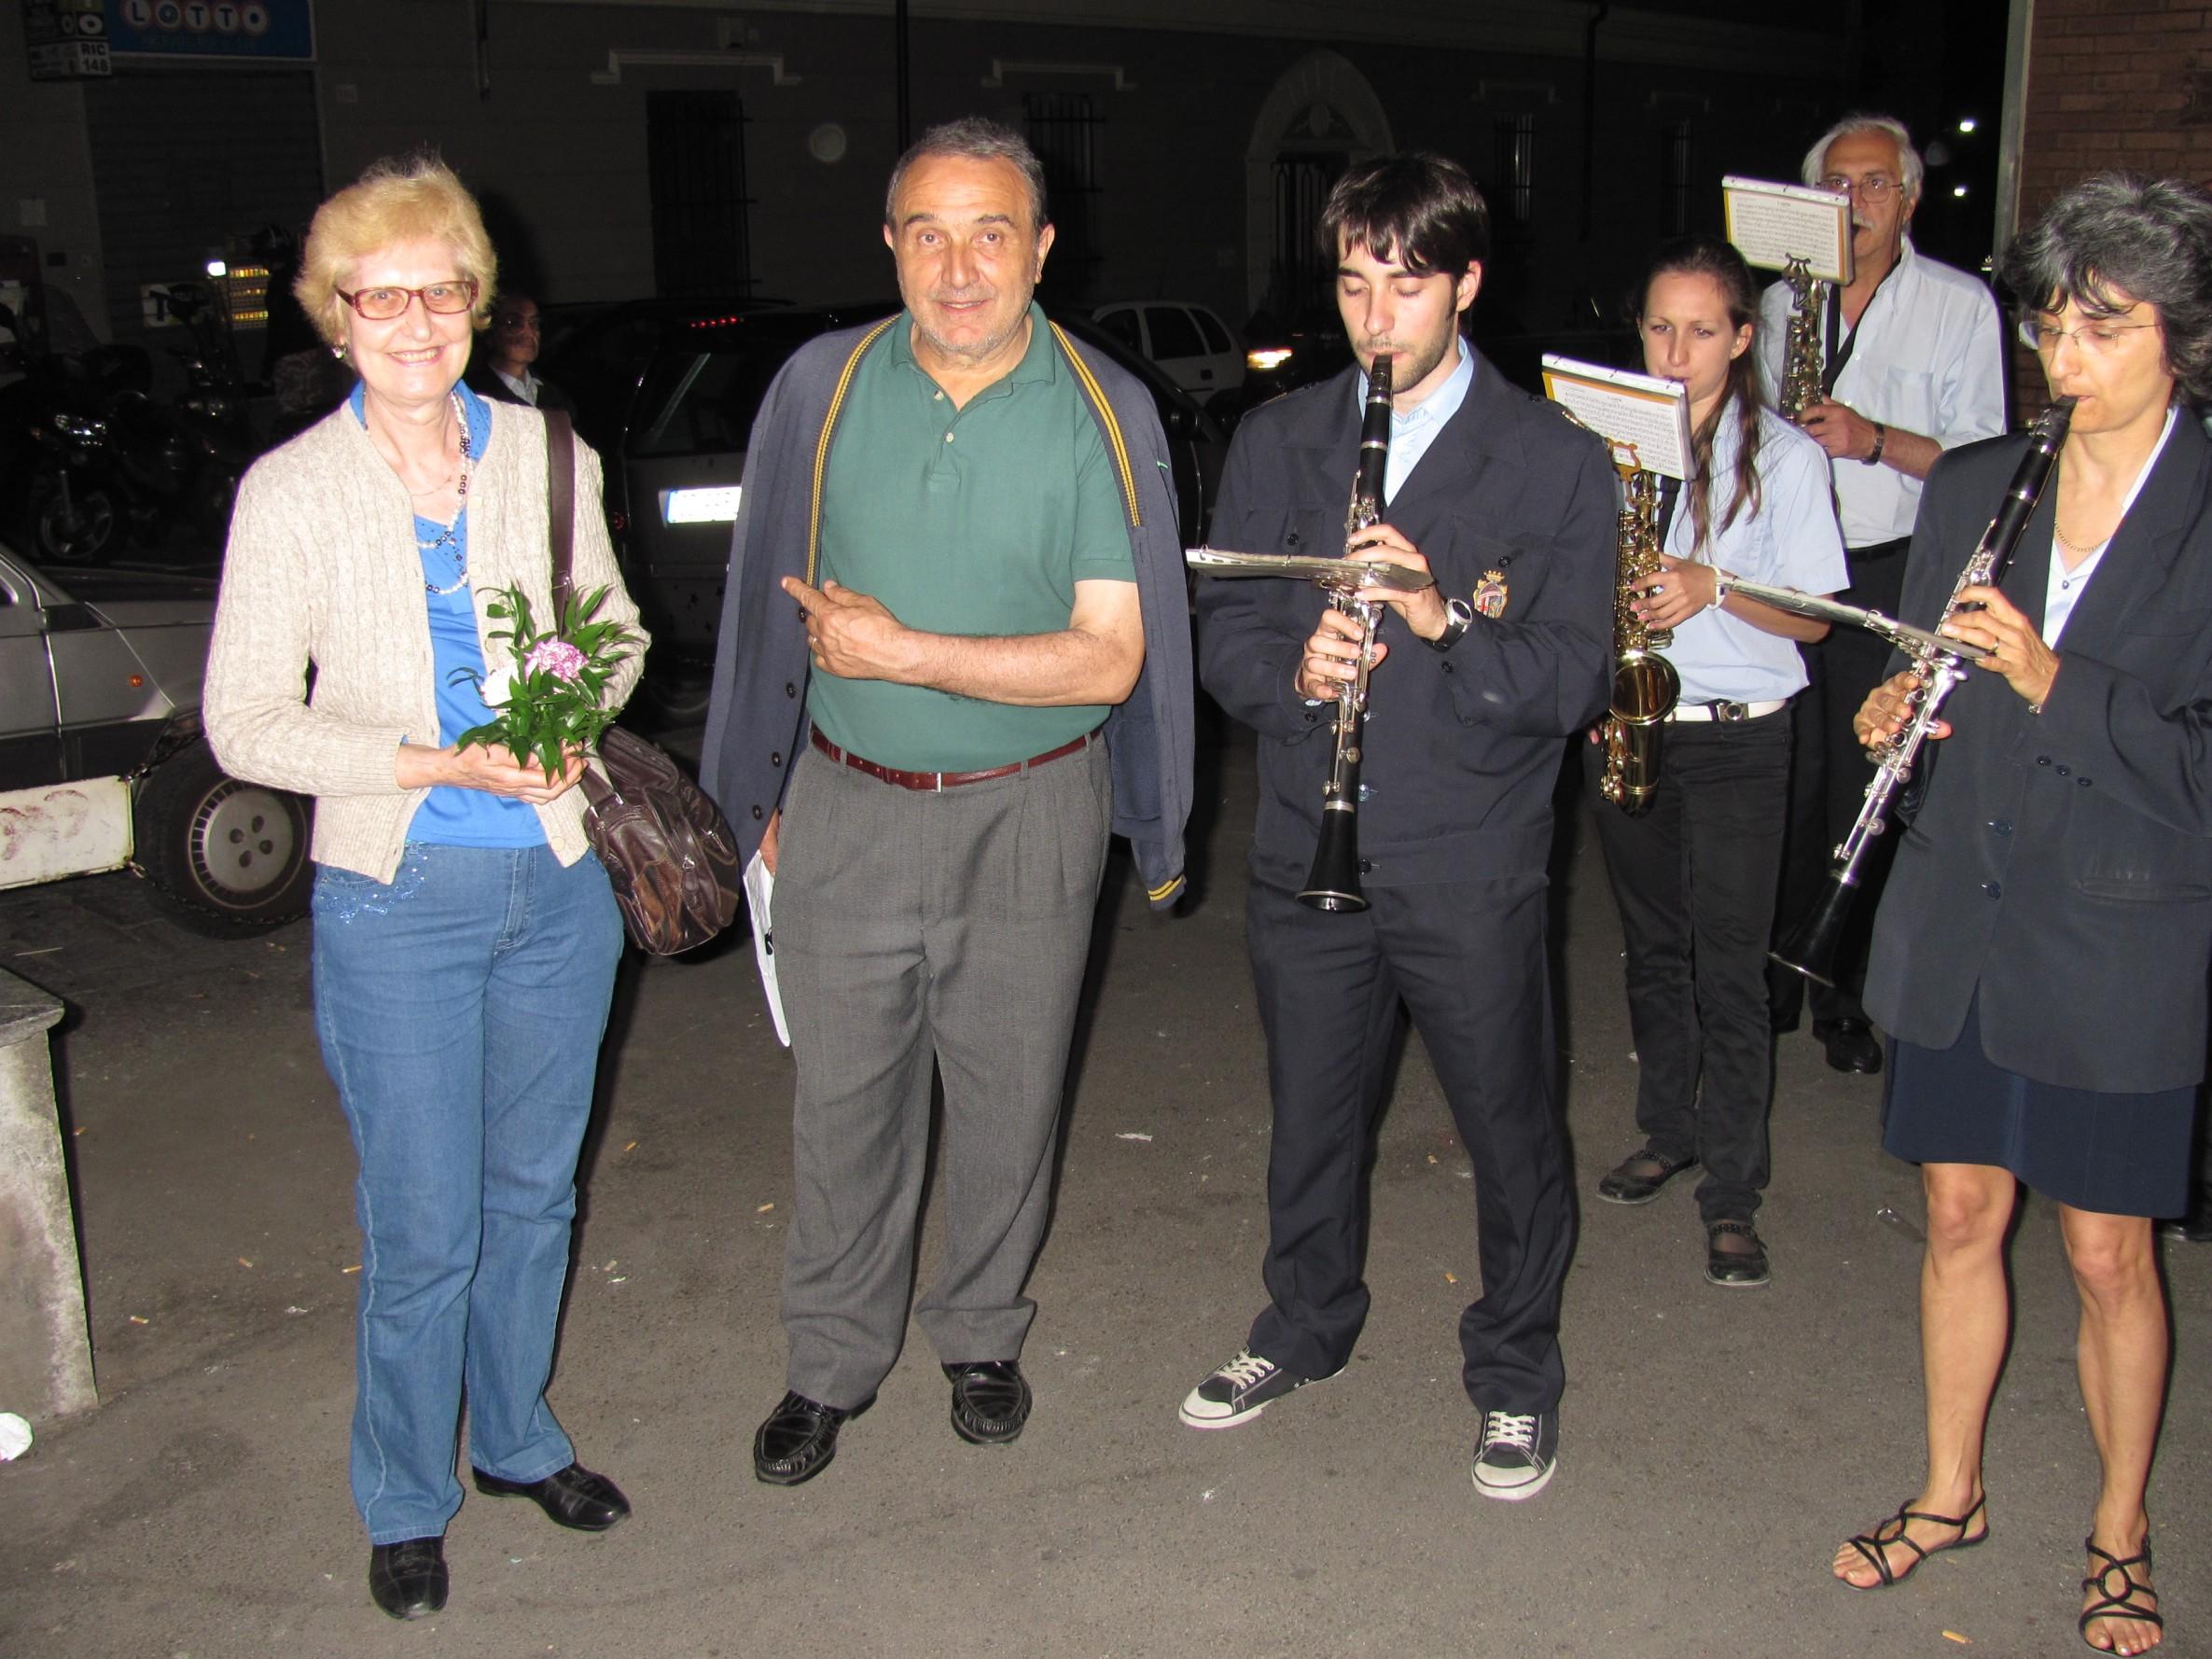 festa_madonna-2011-05-29-22-37-00